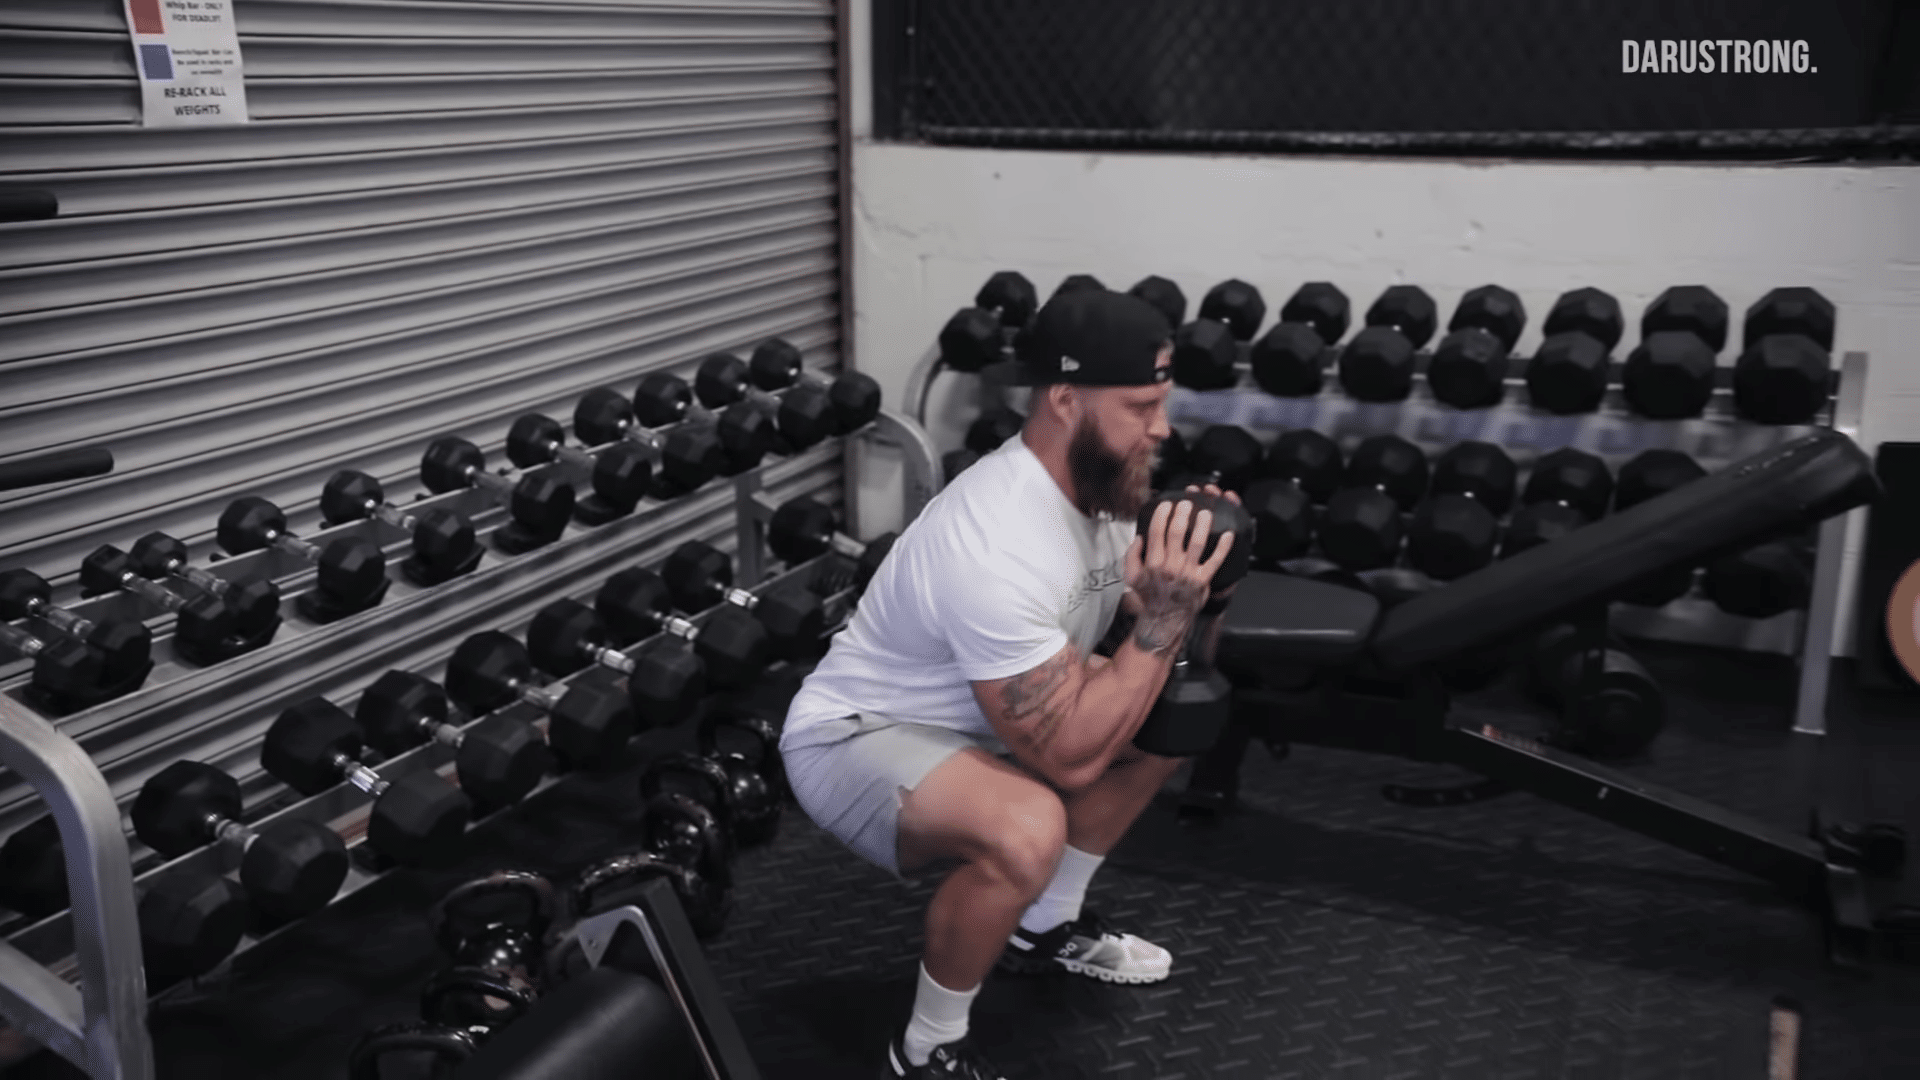 8 Best Dumbbell Exercises for Combat Sports Performance 1